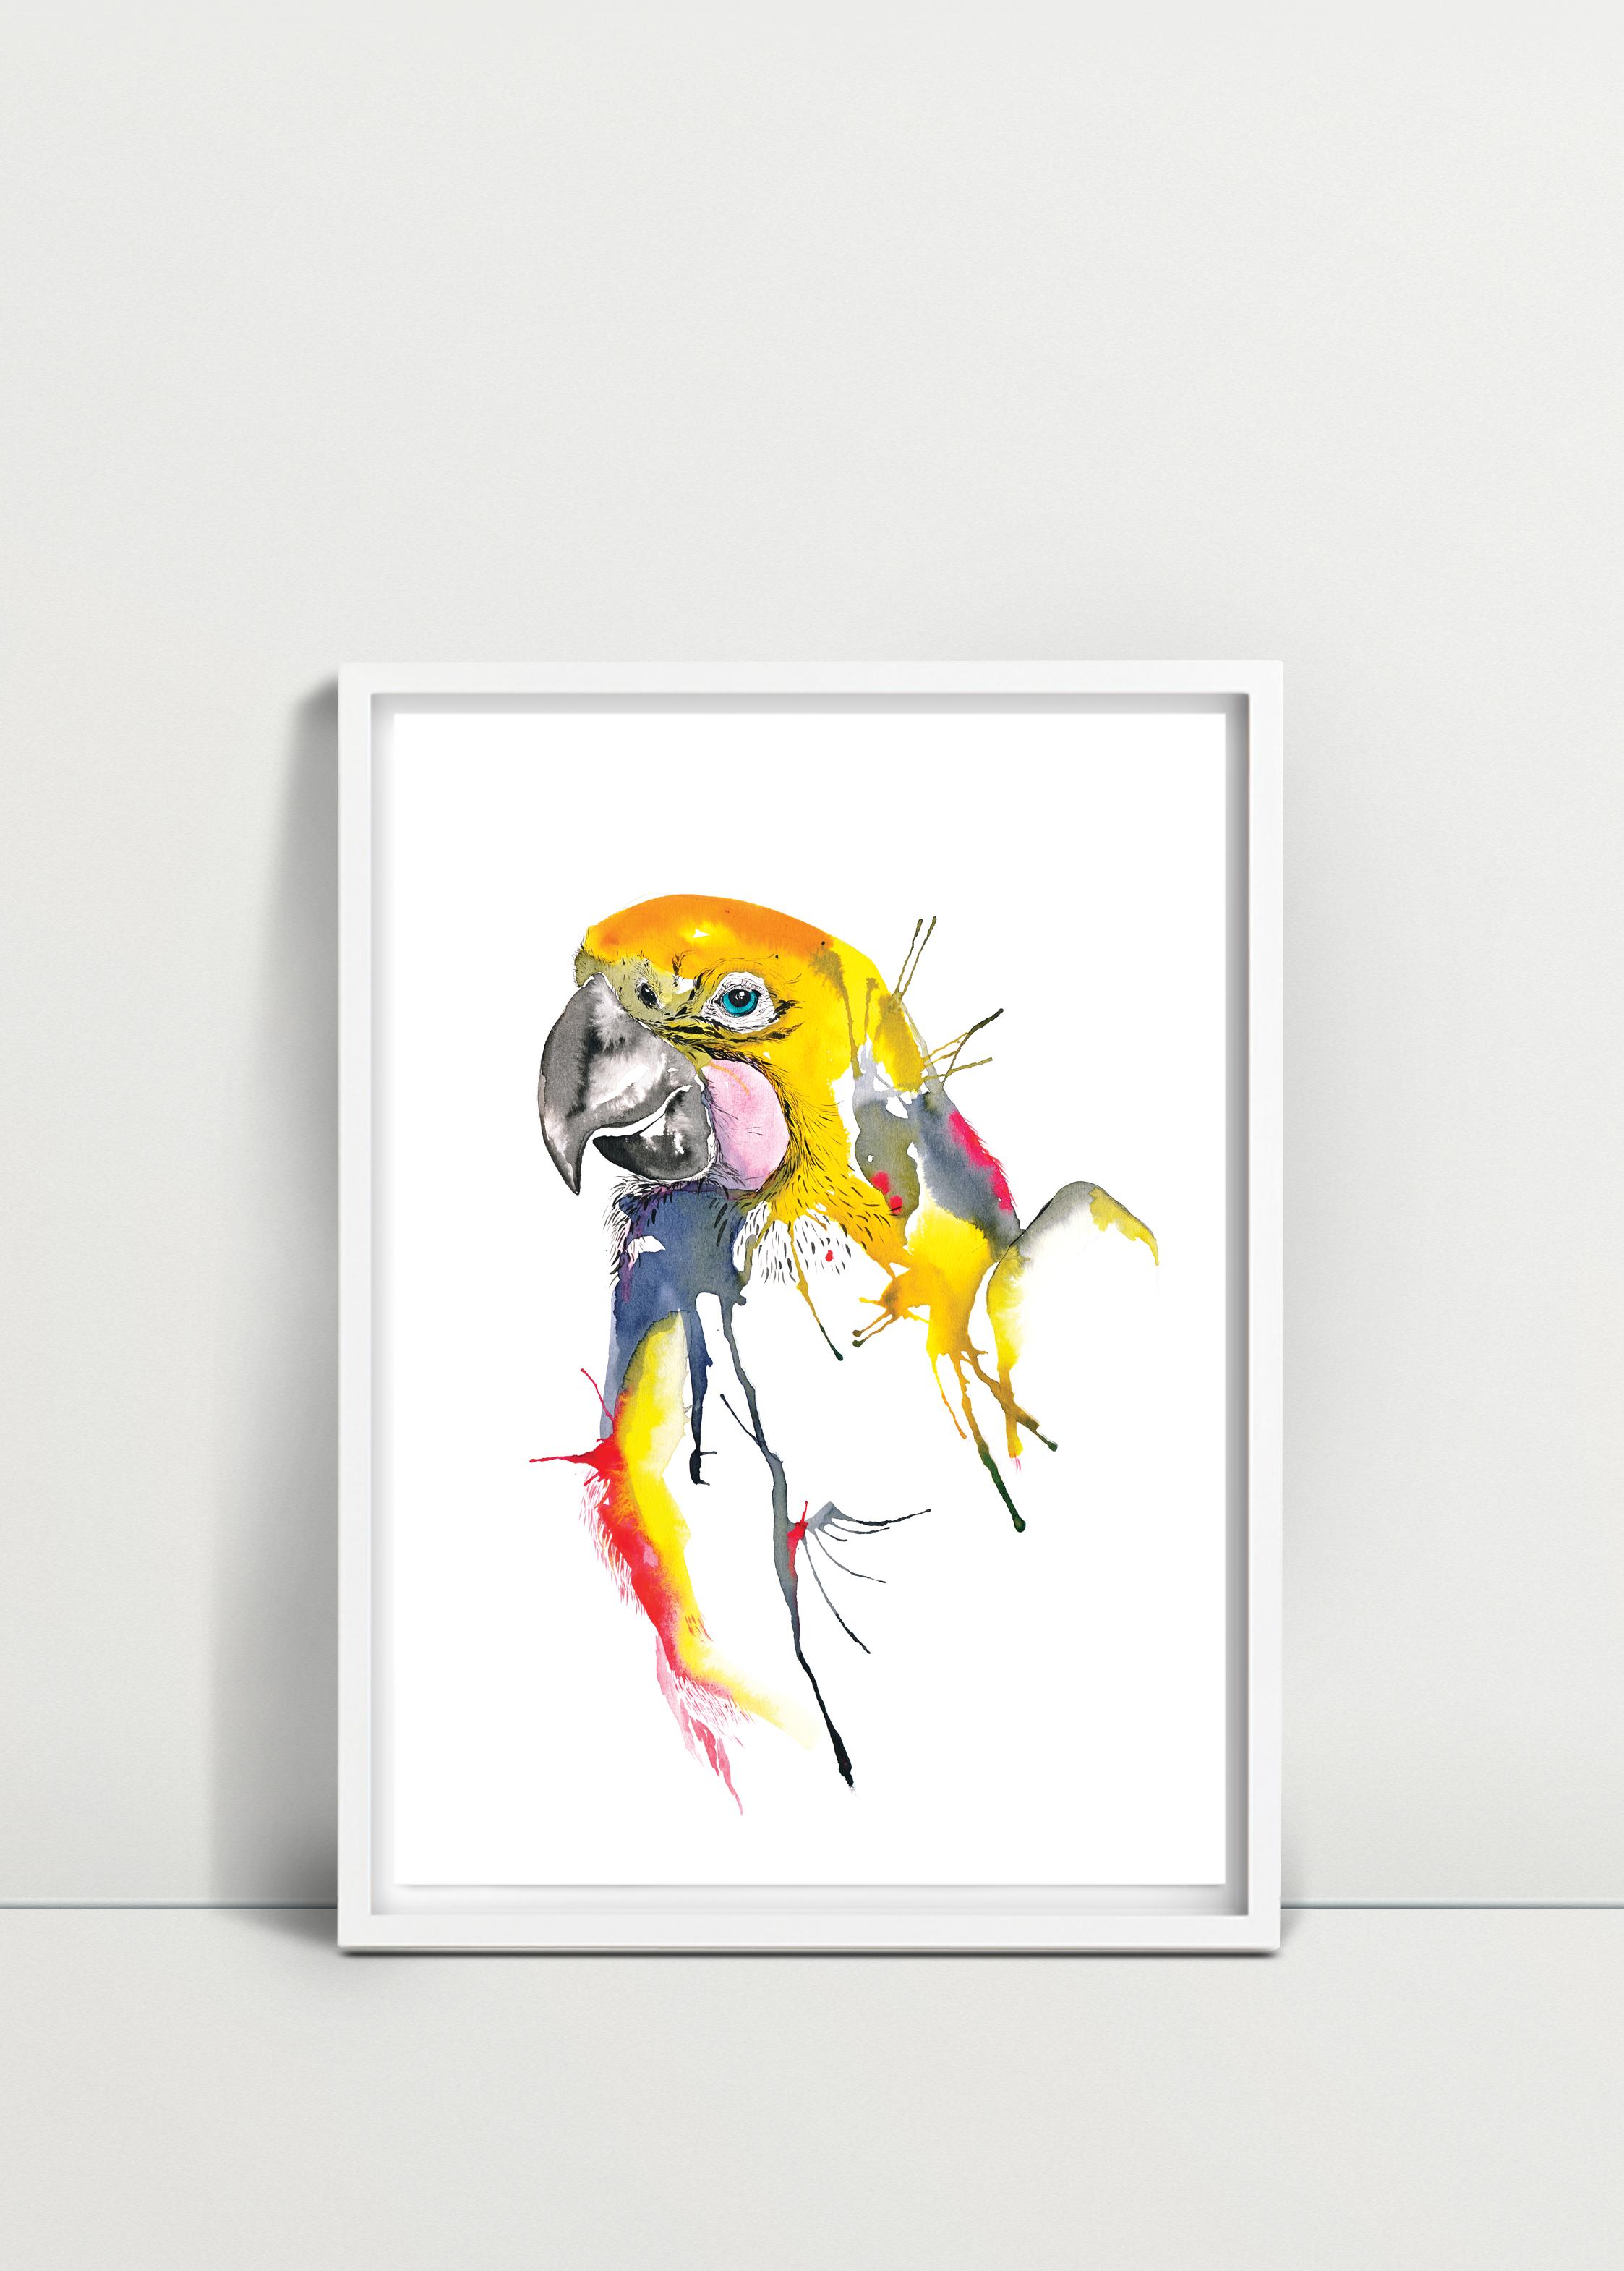 Parrot_22.png